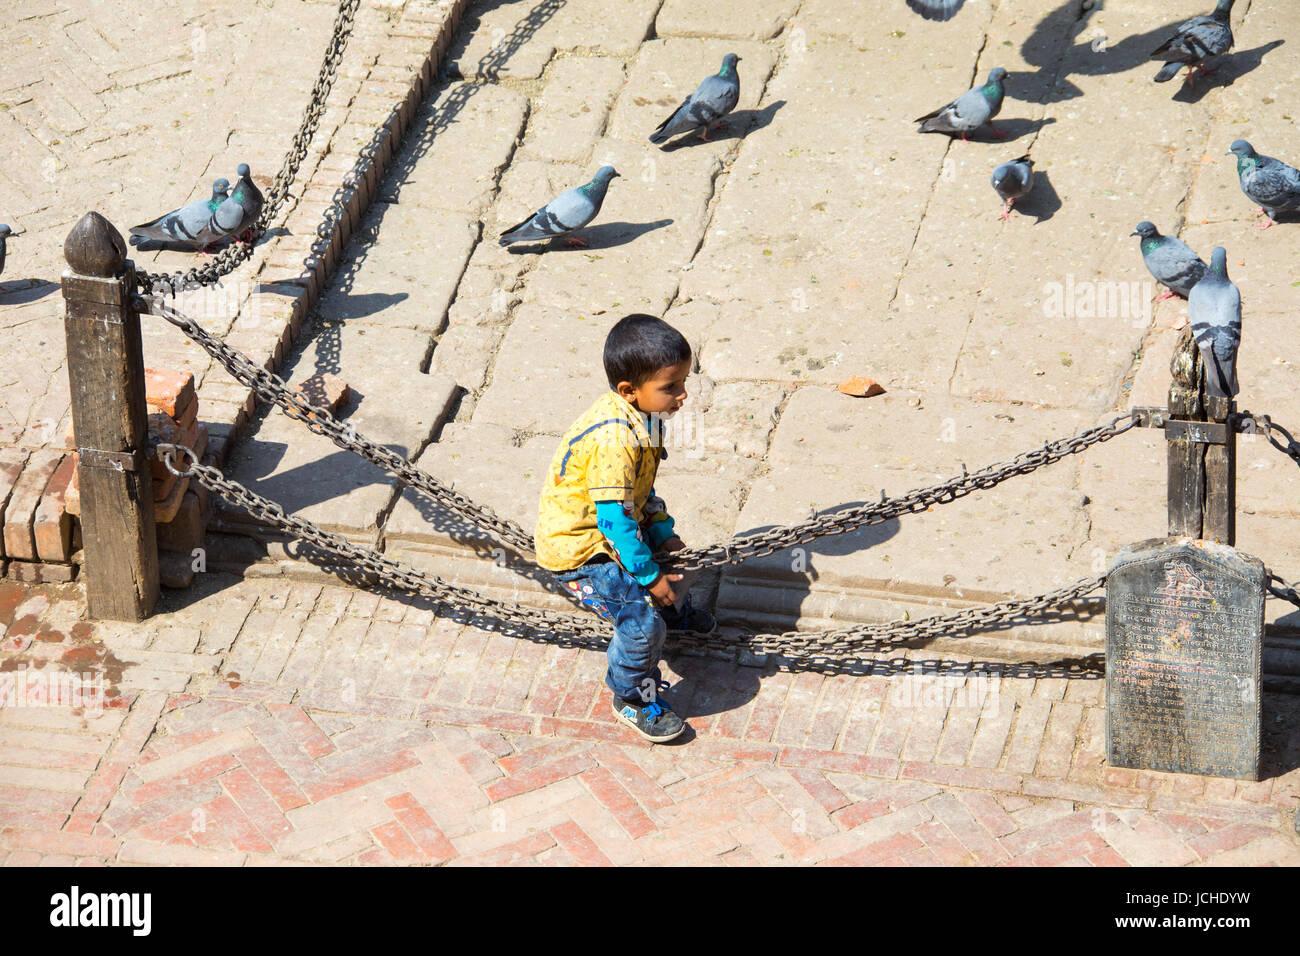 Local boy in Patan Durbar Square, Kathmandu, Nepal - Stock Image